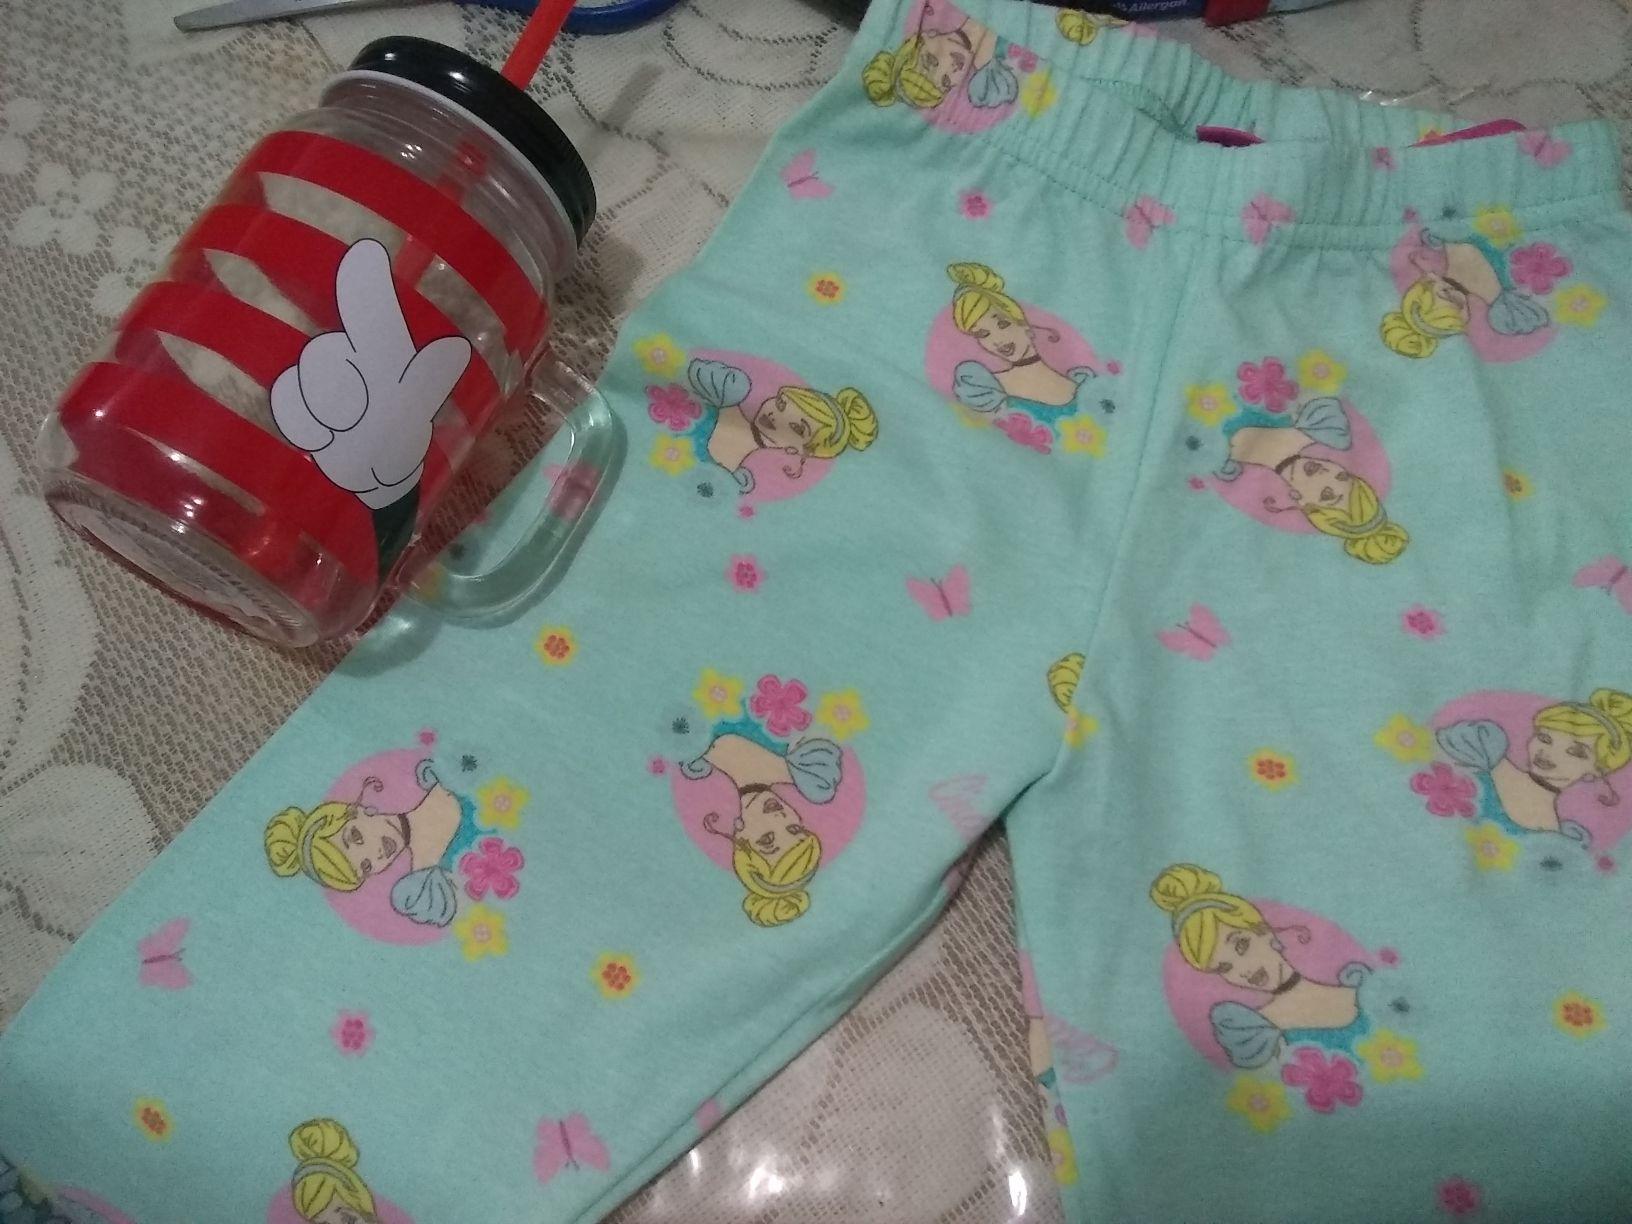 Bodega Aurrerá: Mazon jar Mickey, leggins, boxers, Grossery gang y zequins